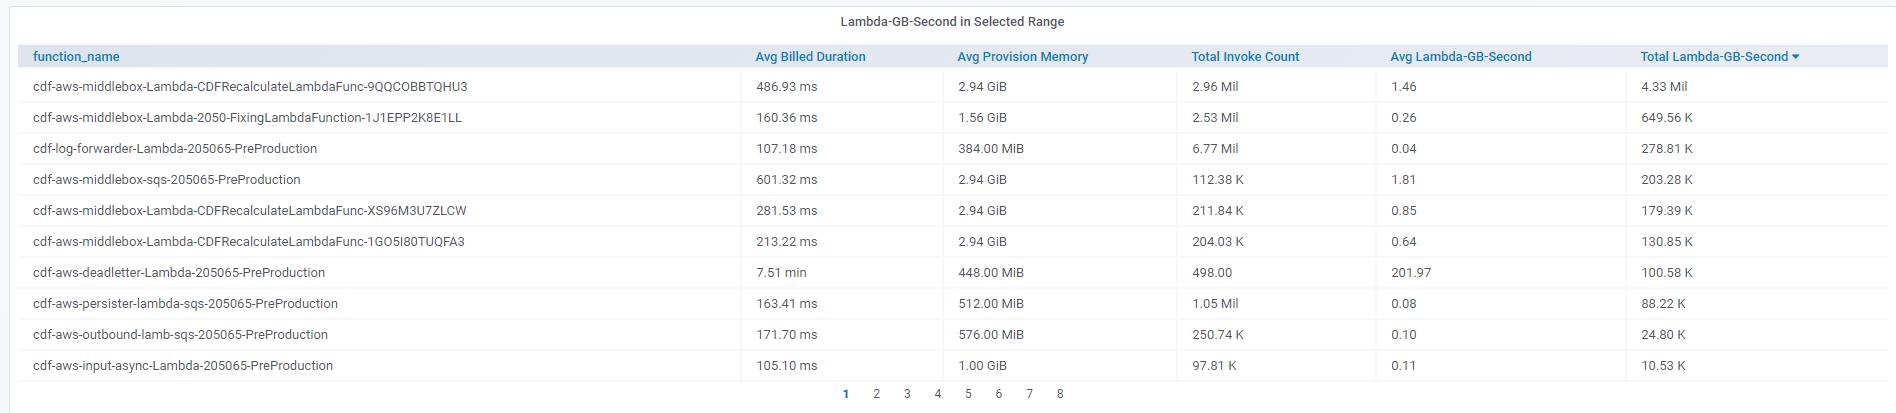 lambda_most_expensive